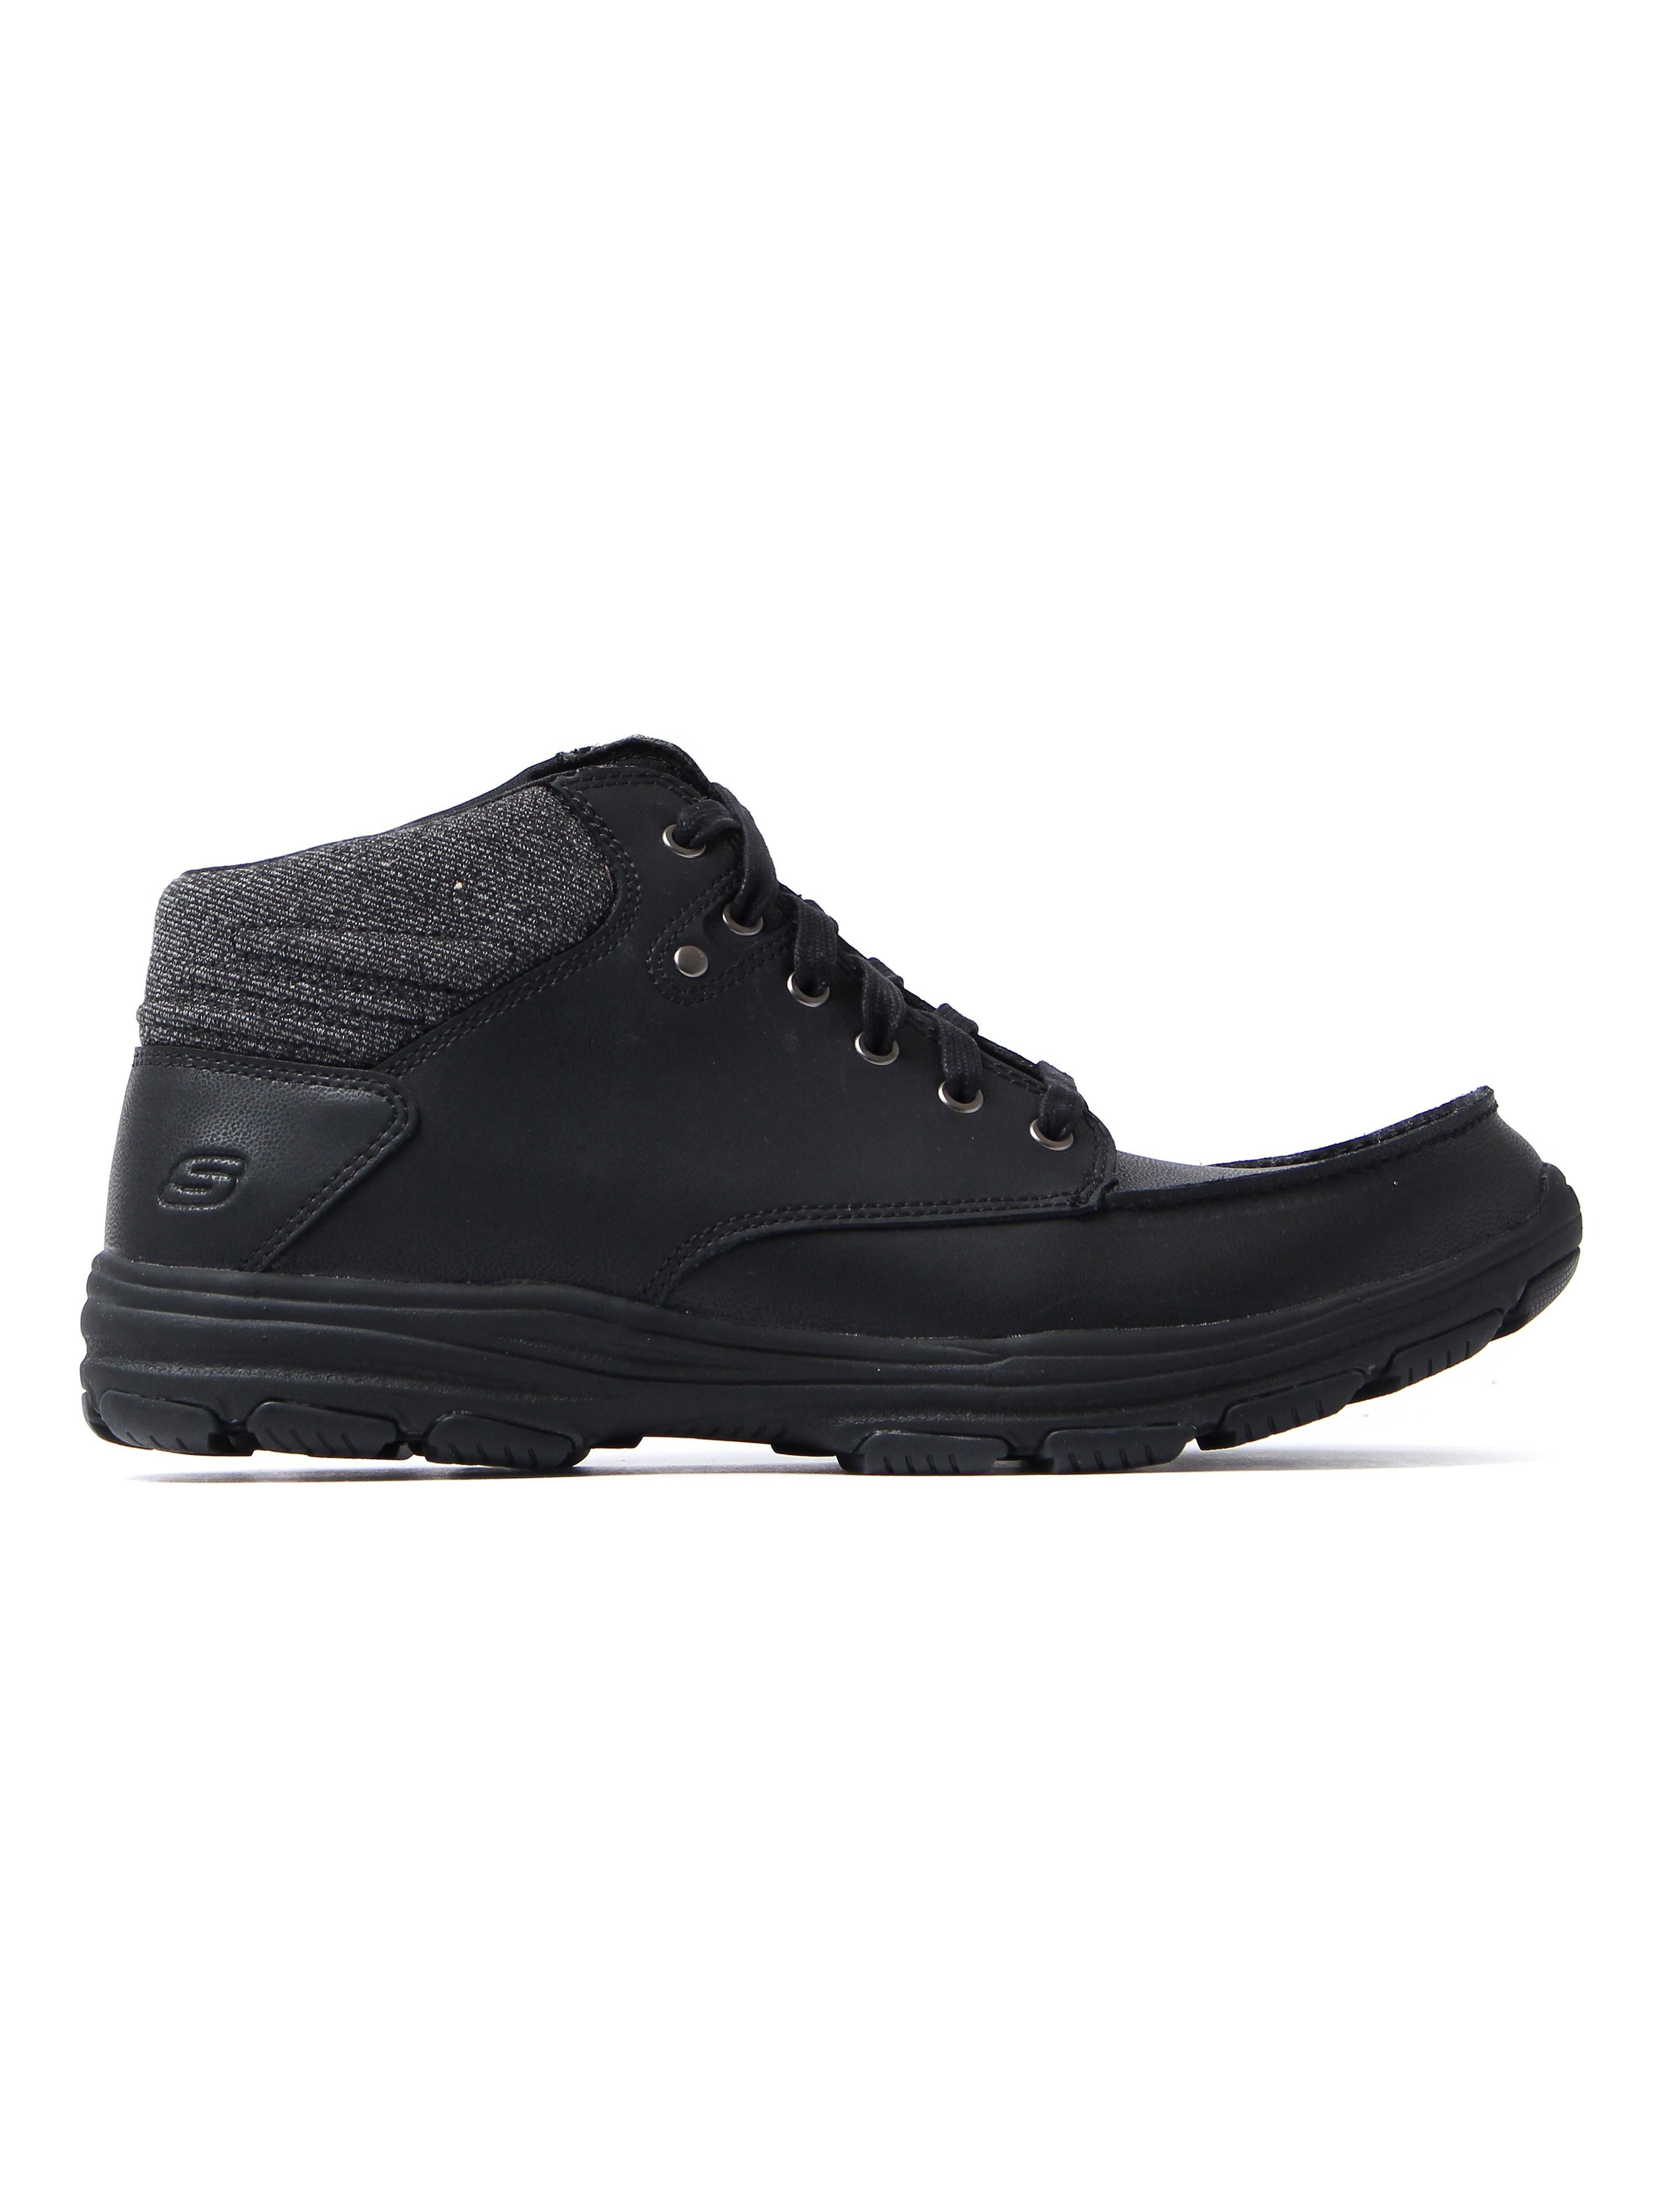 Skechers Men's Garton Meleno Chukka Boots - Black